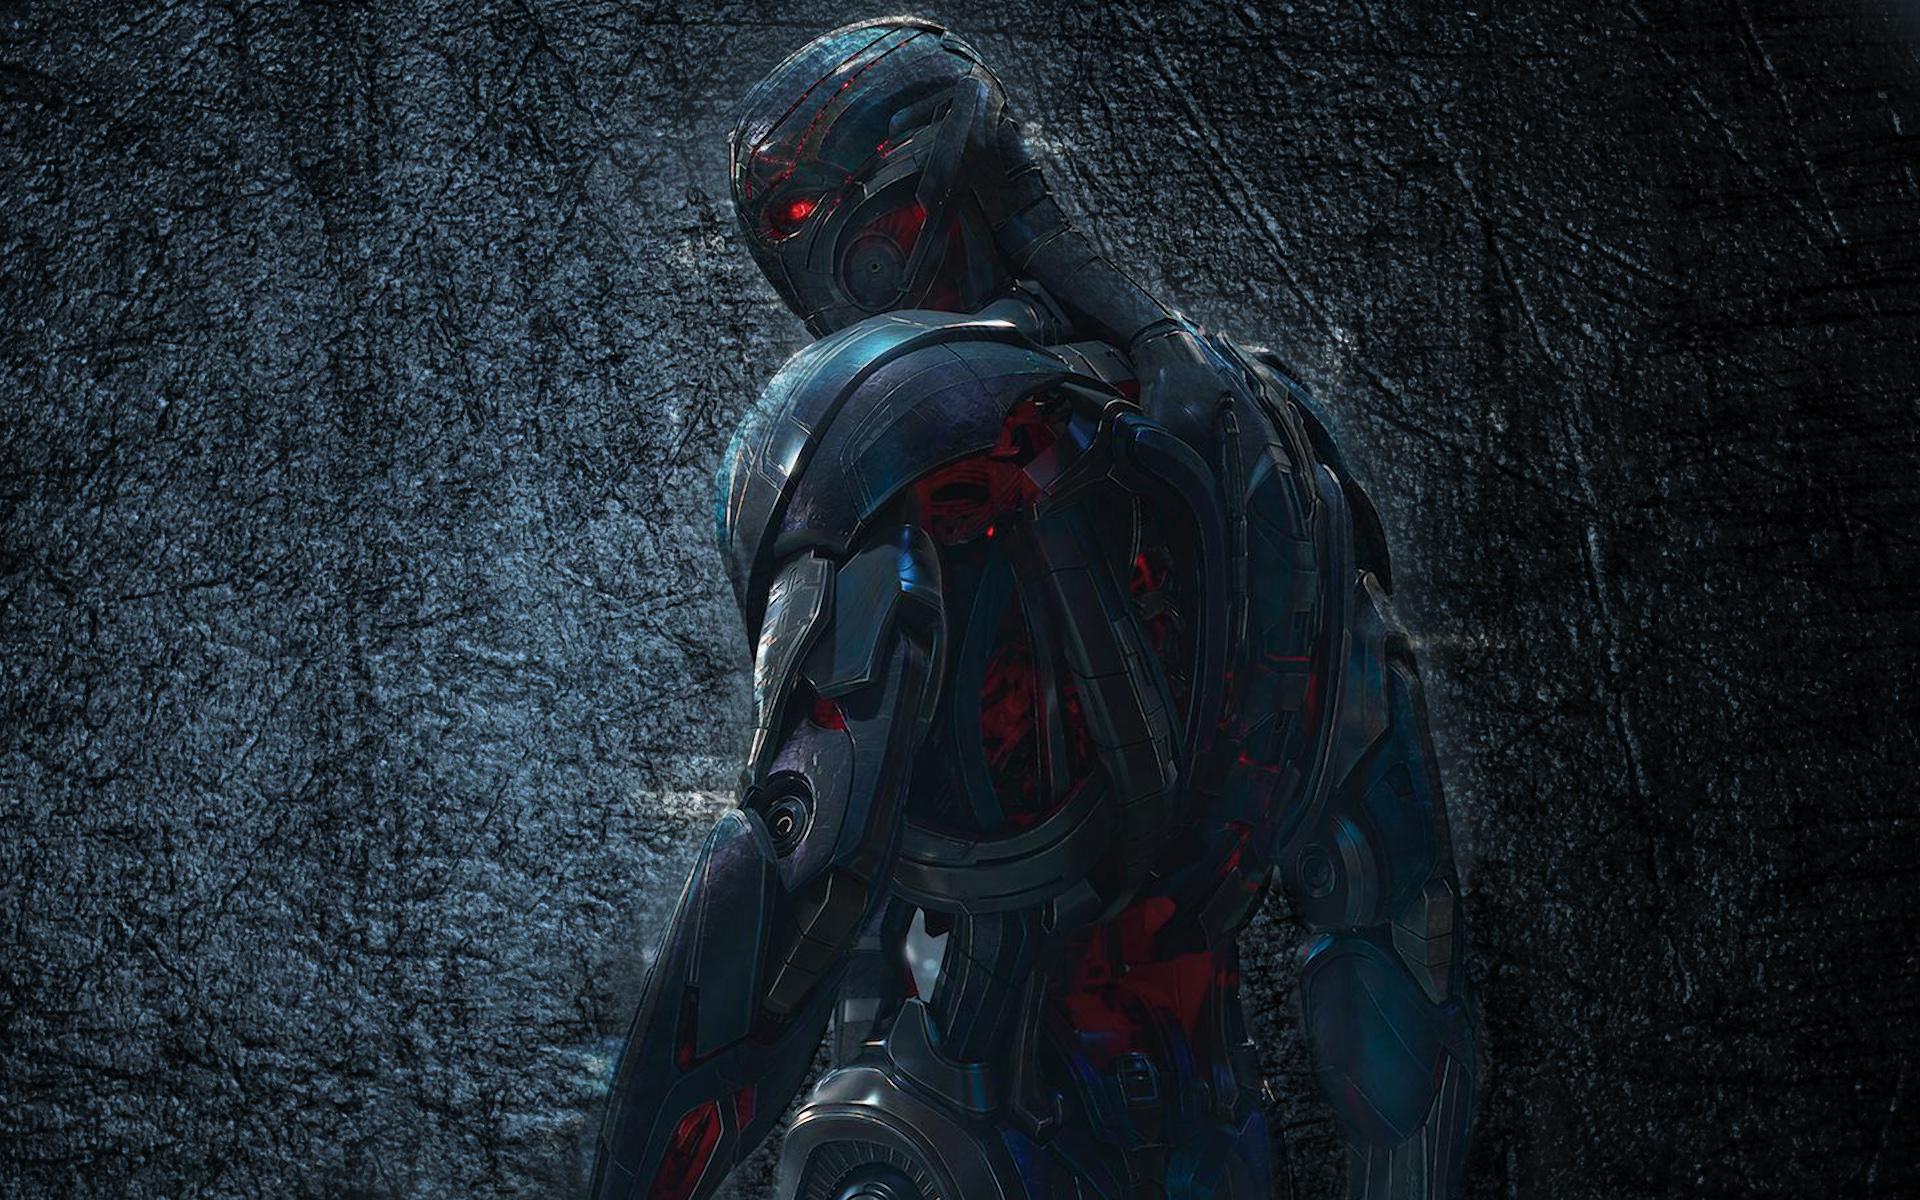 Hd Marvel Wallpaper Download 1920x1200